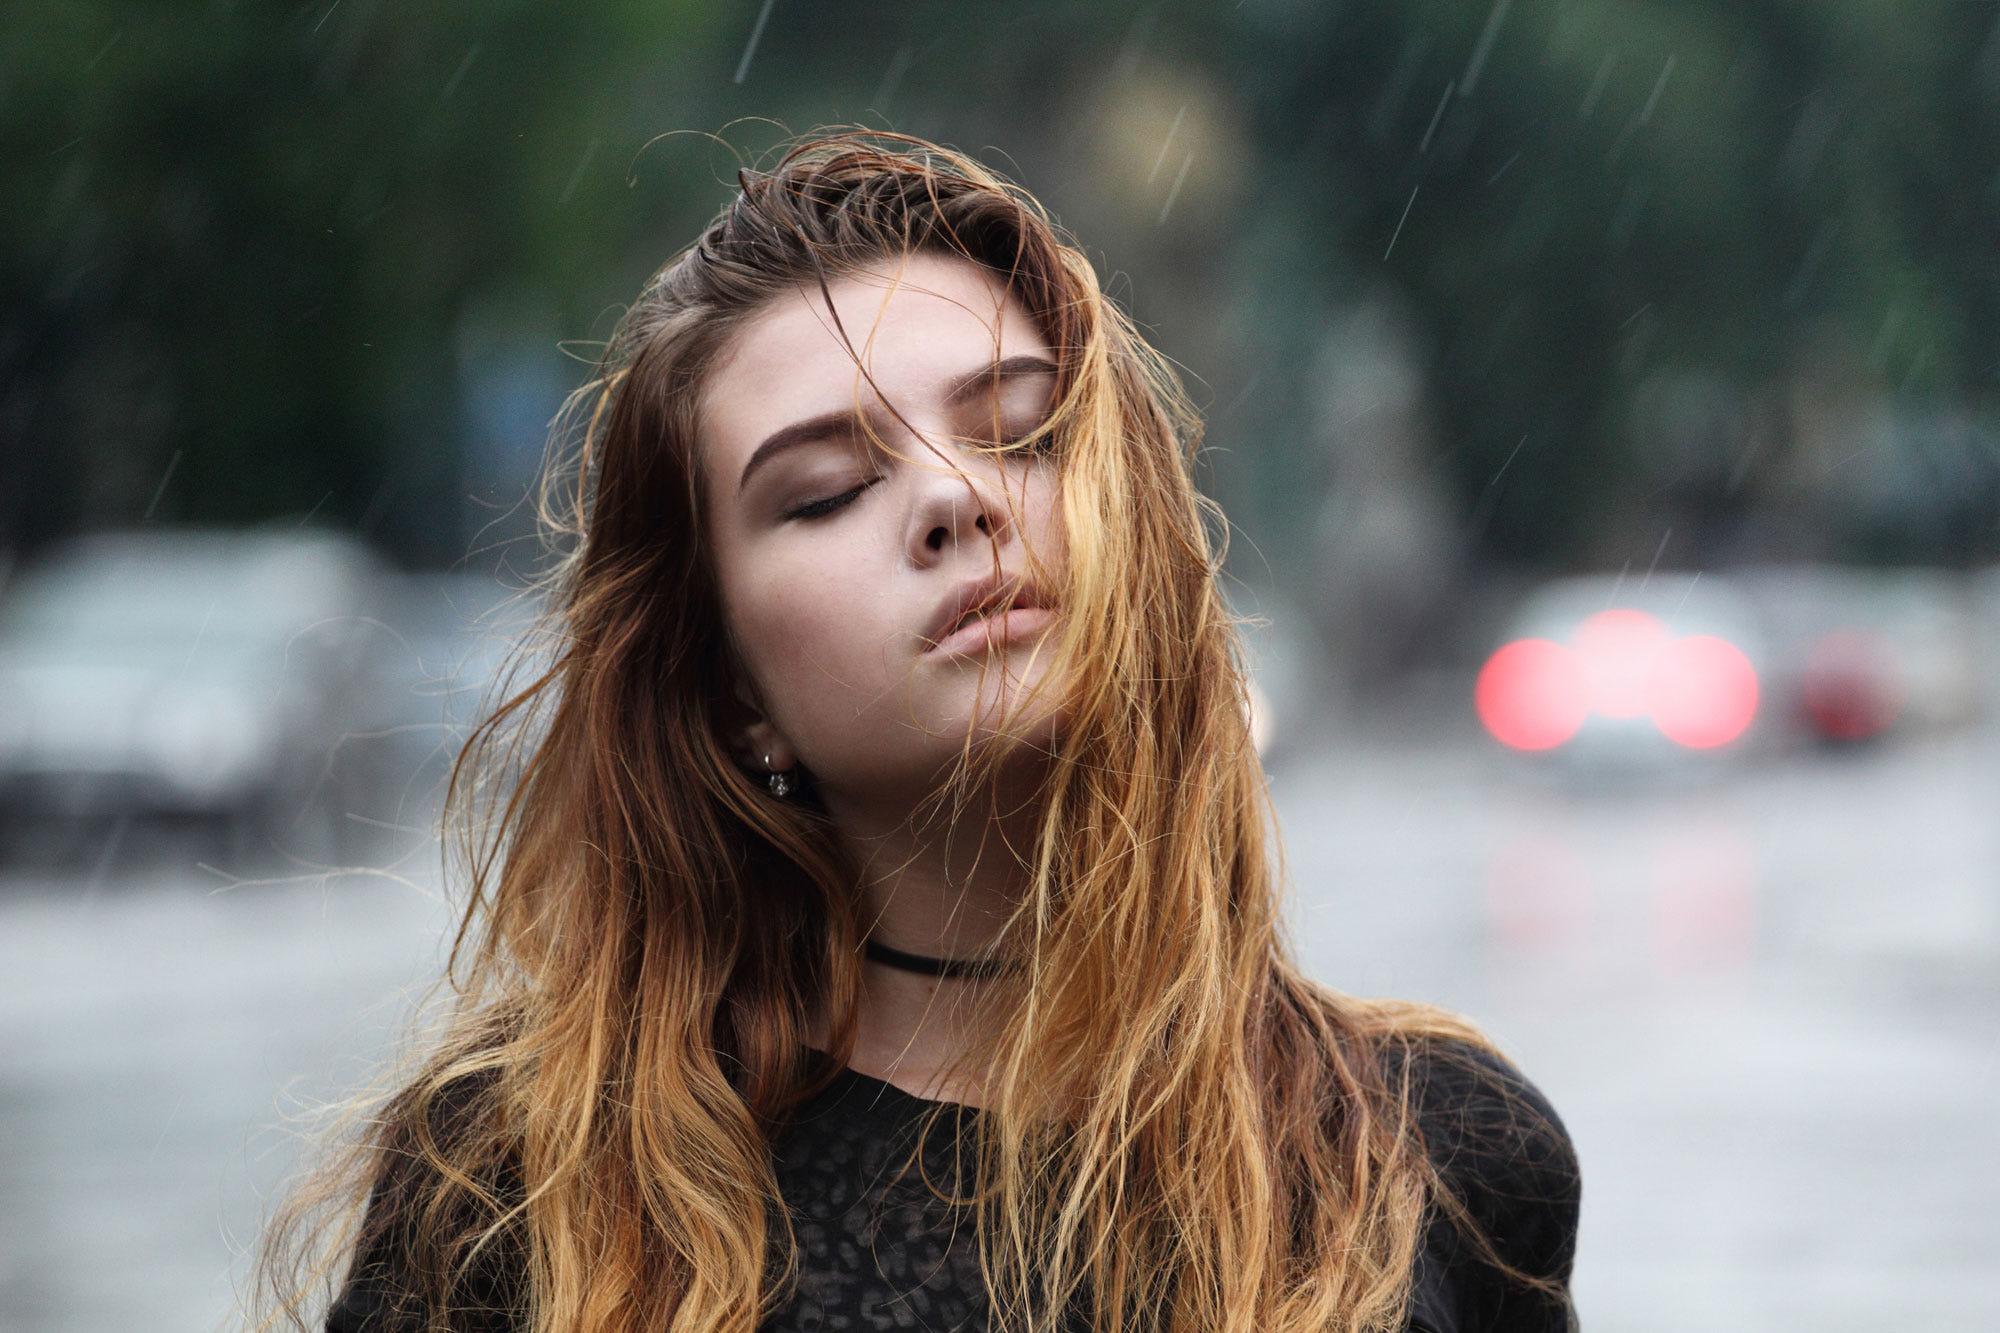 People 2000x1333 women outdoors face hair in face closed eyes portrait depth of field straight hair blonde bokeh women